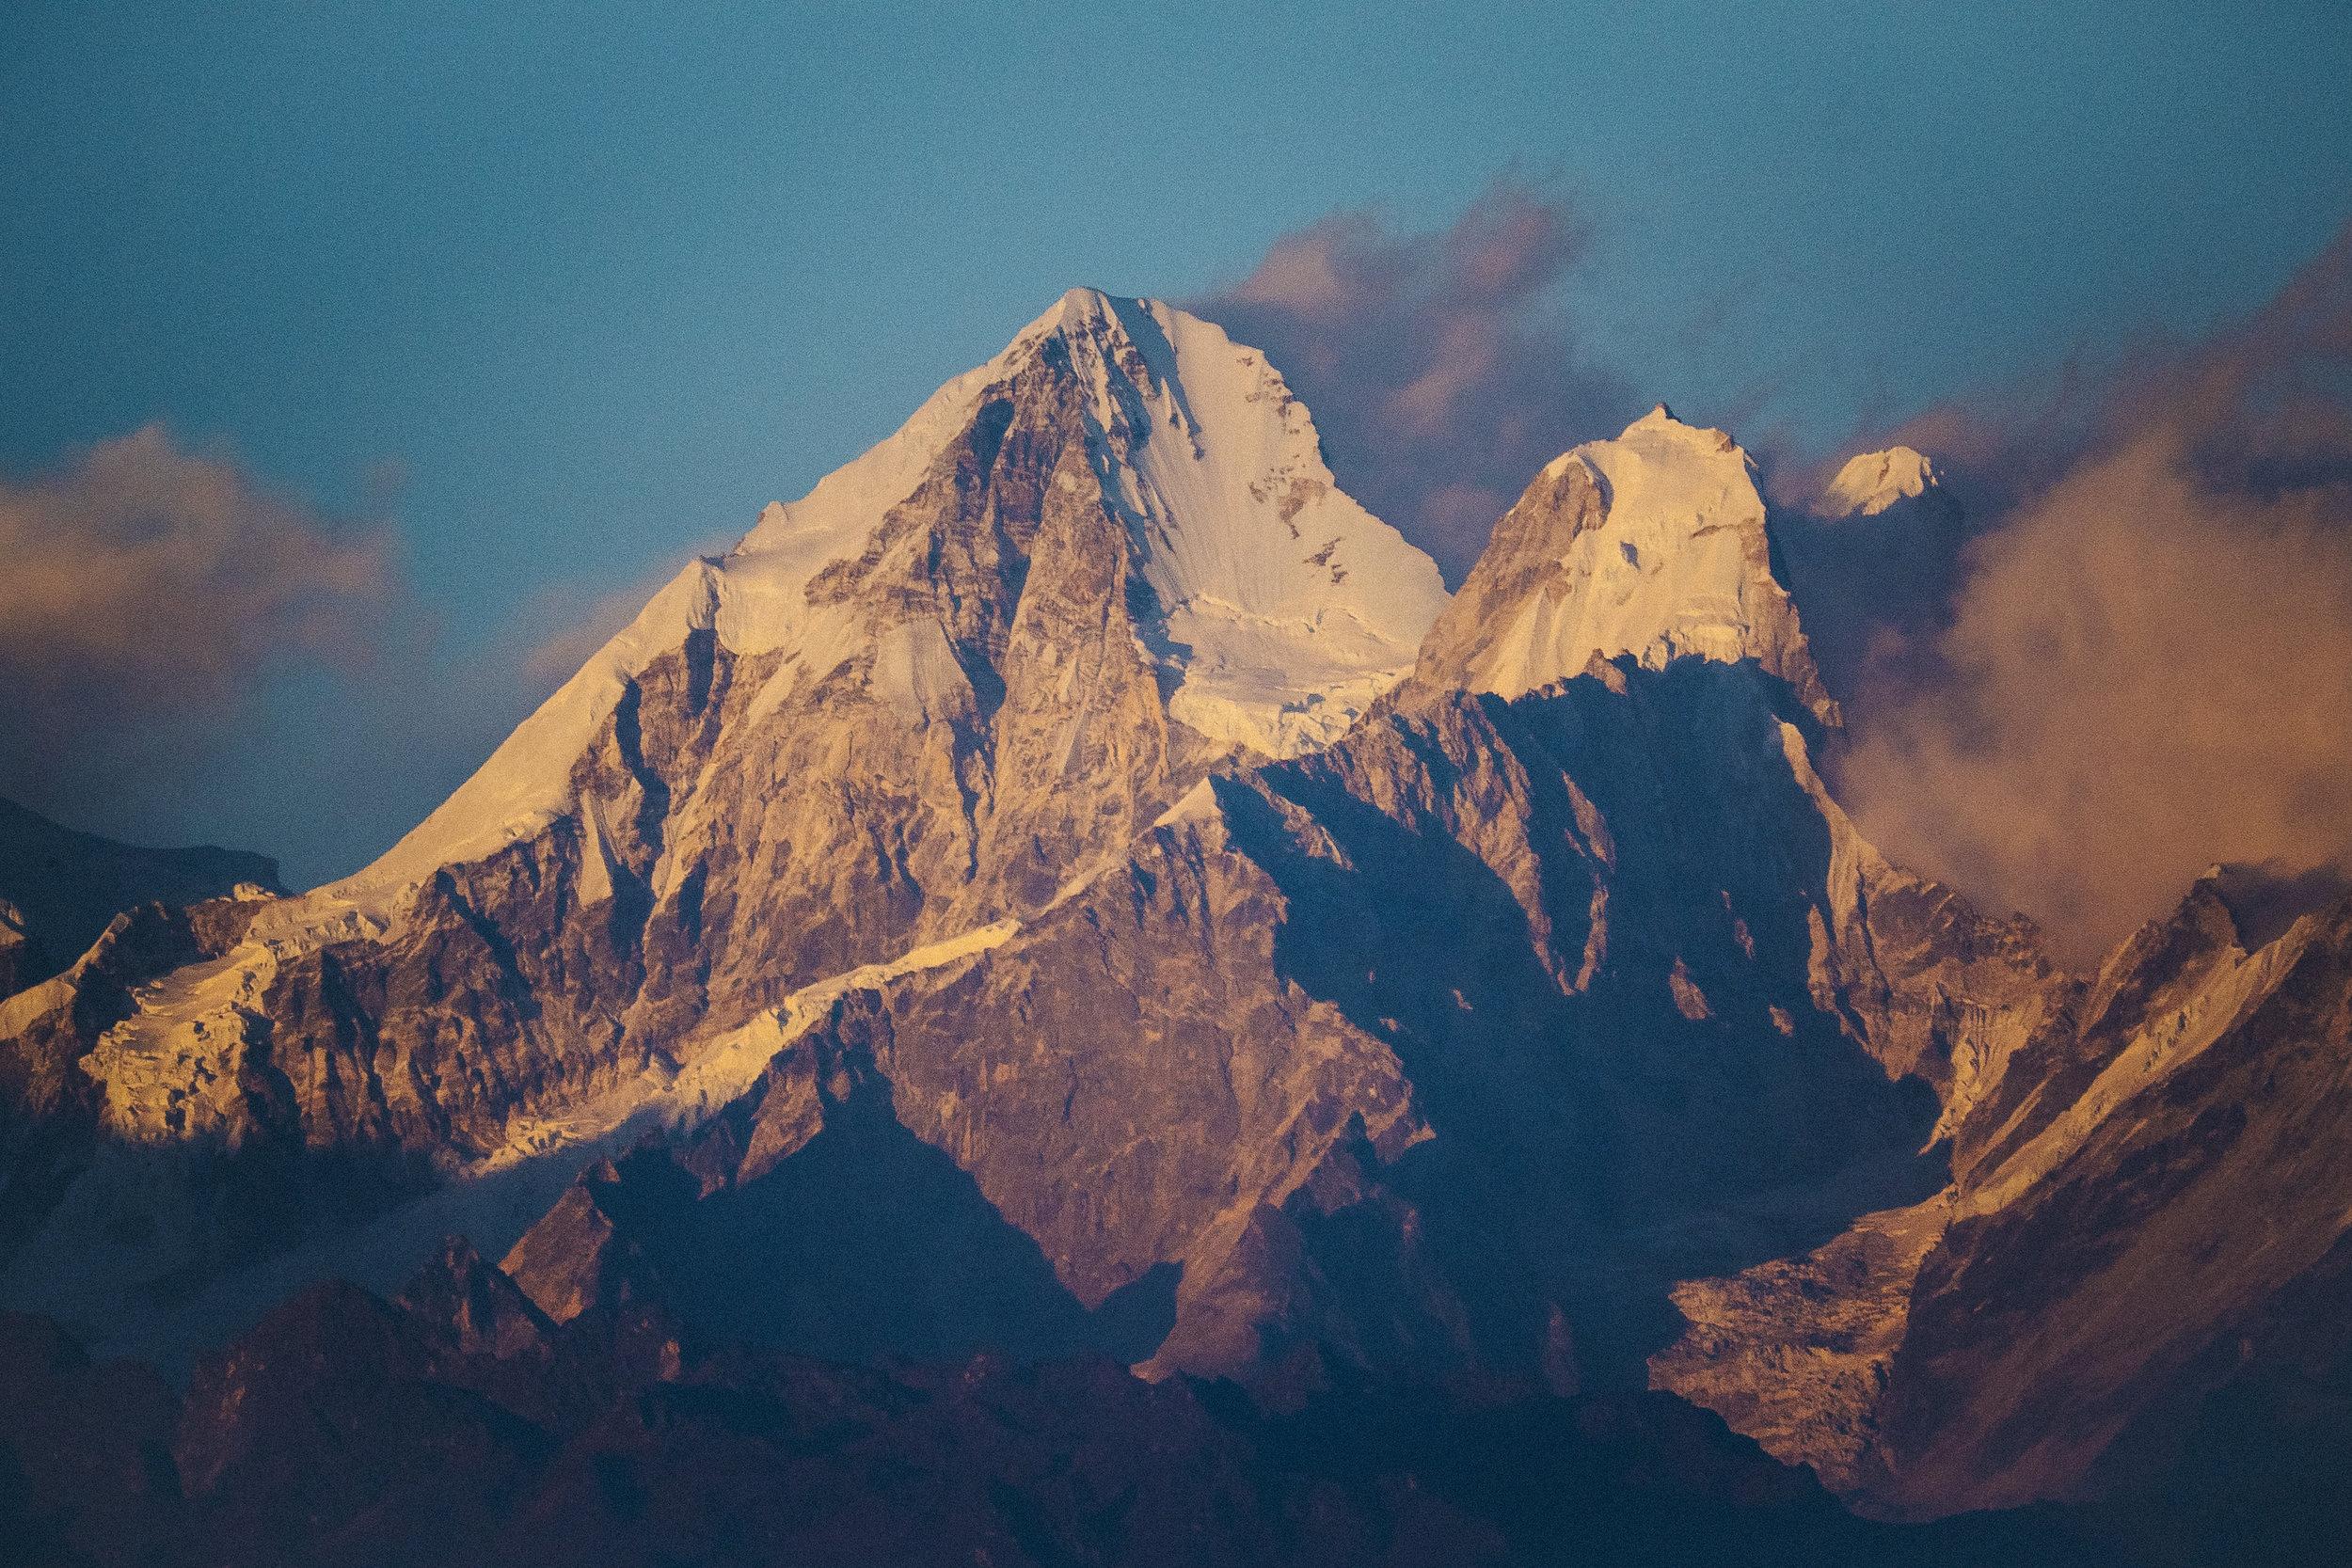 Mt. Dorjelakpa - Nagarkot, Nepal - 2018